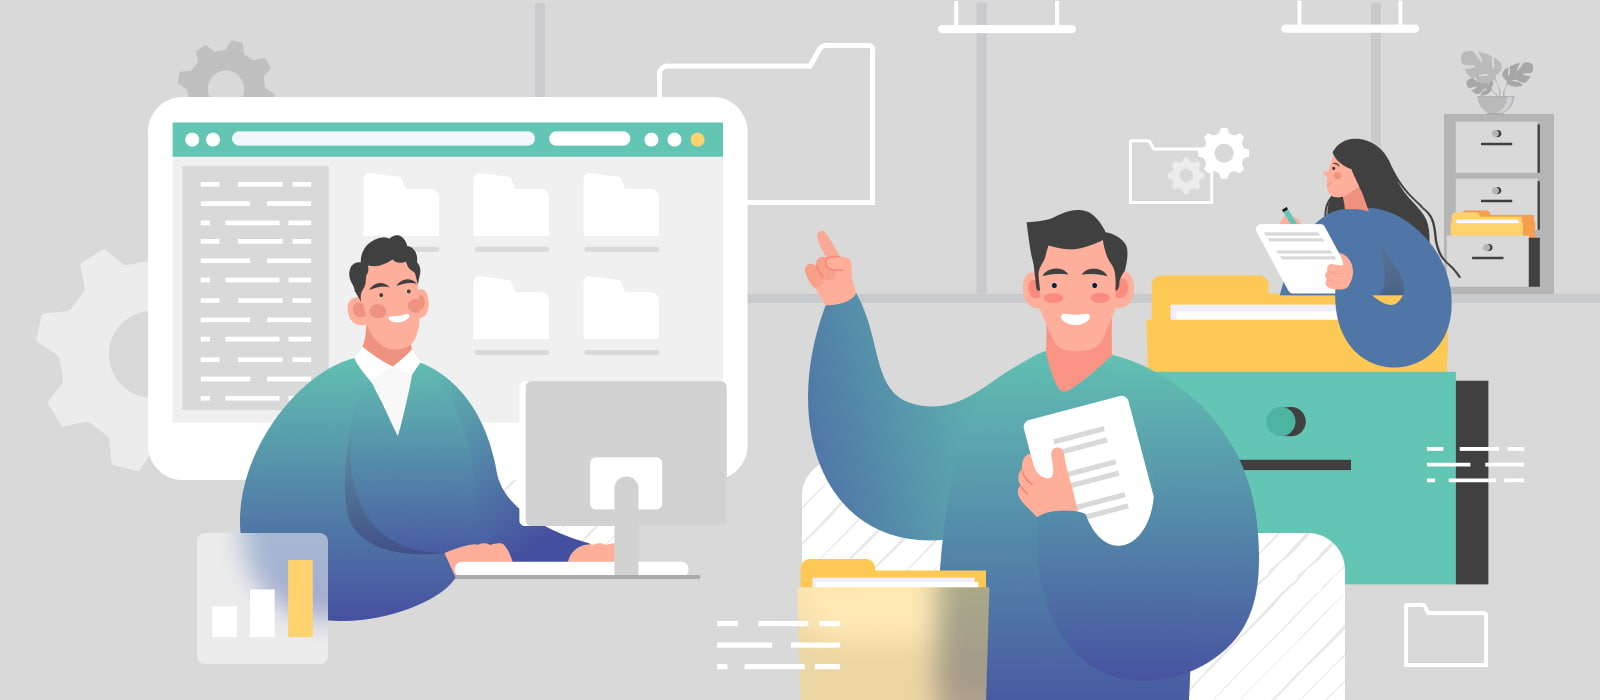 People optimizing document management workflow by utilizing digital tools